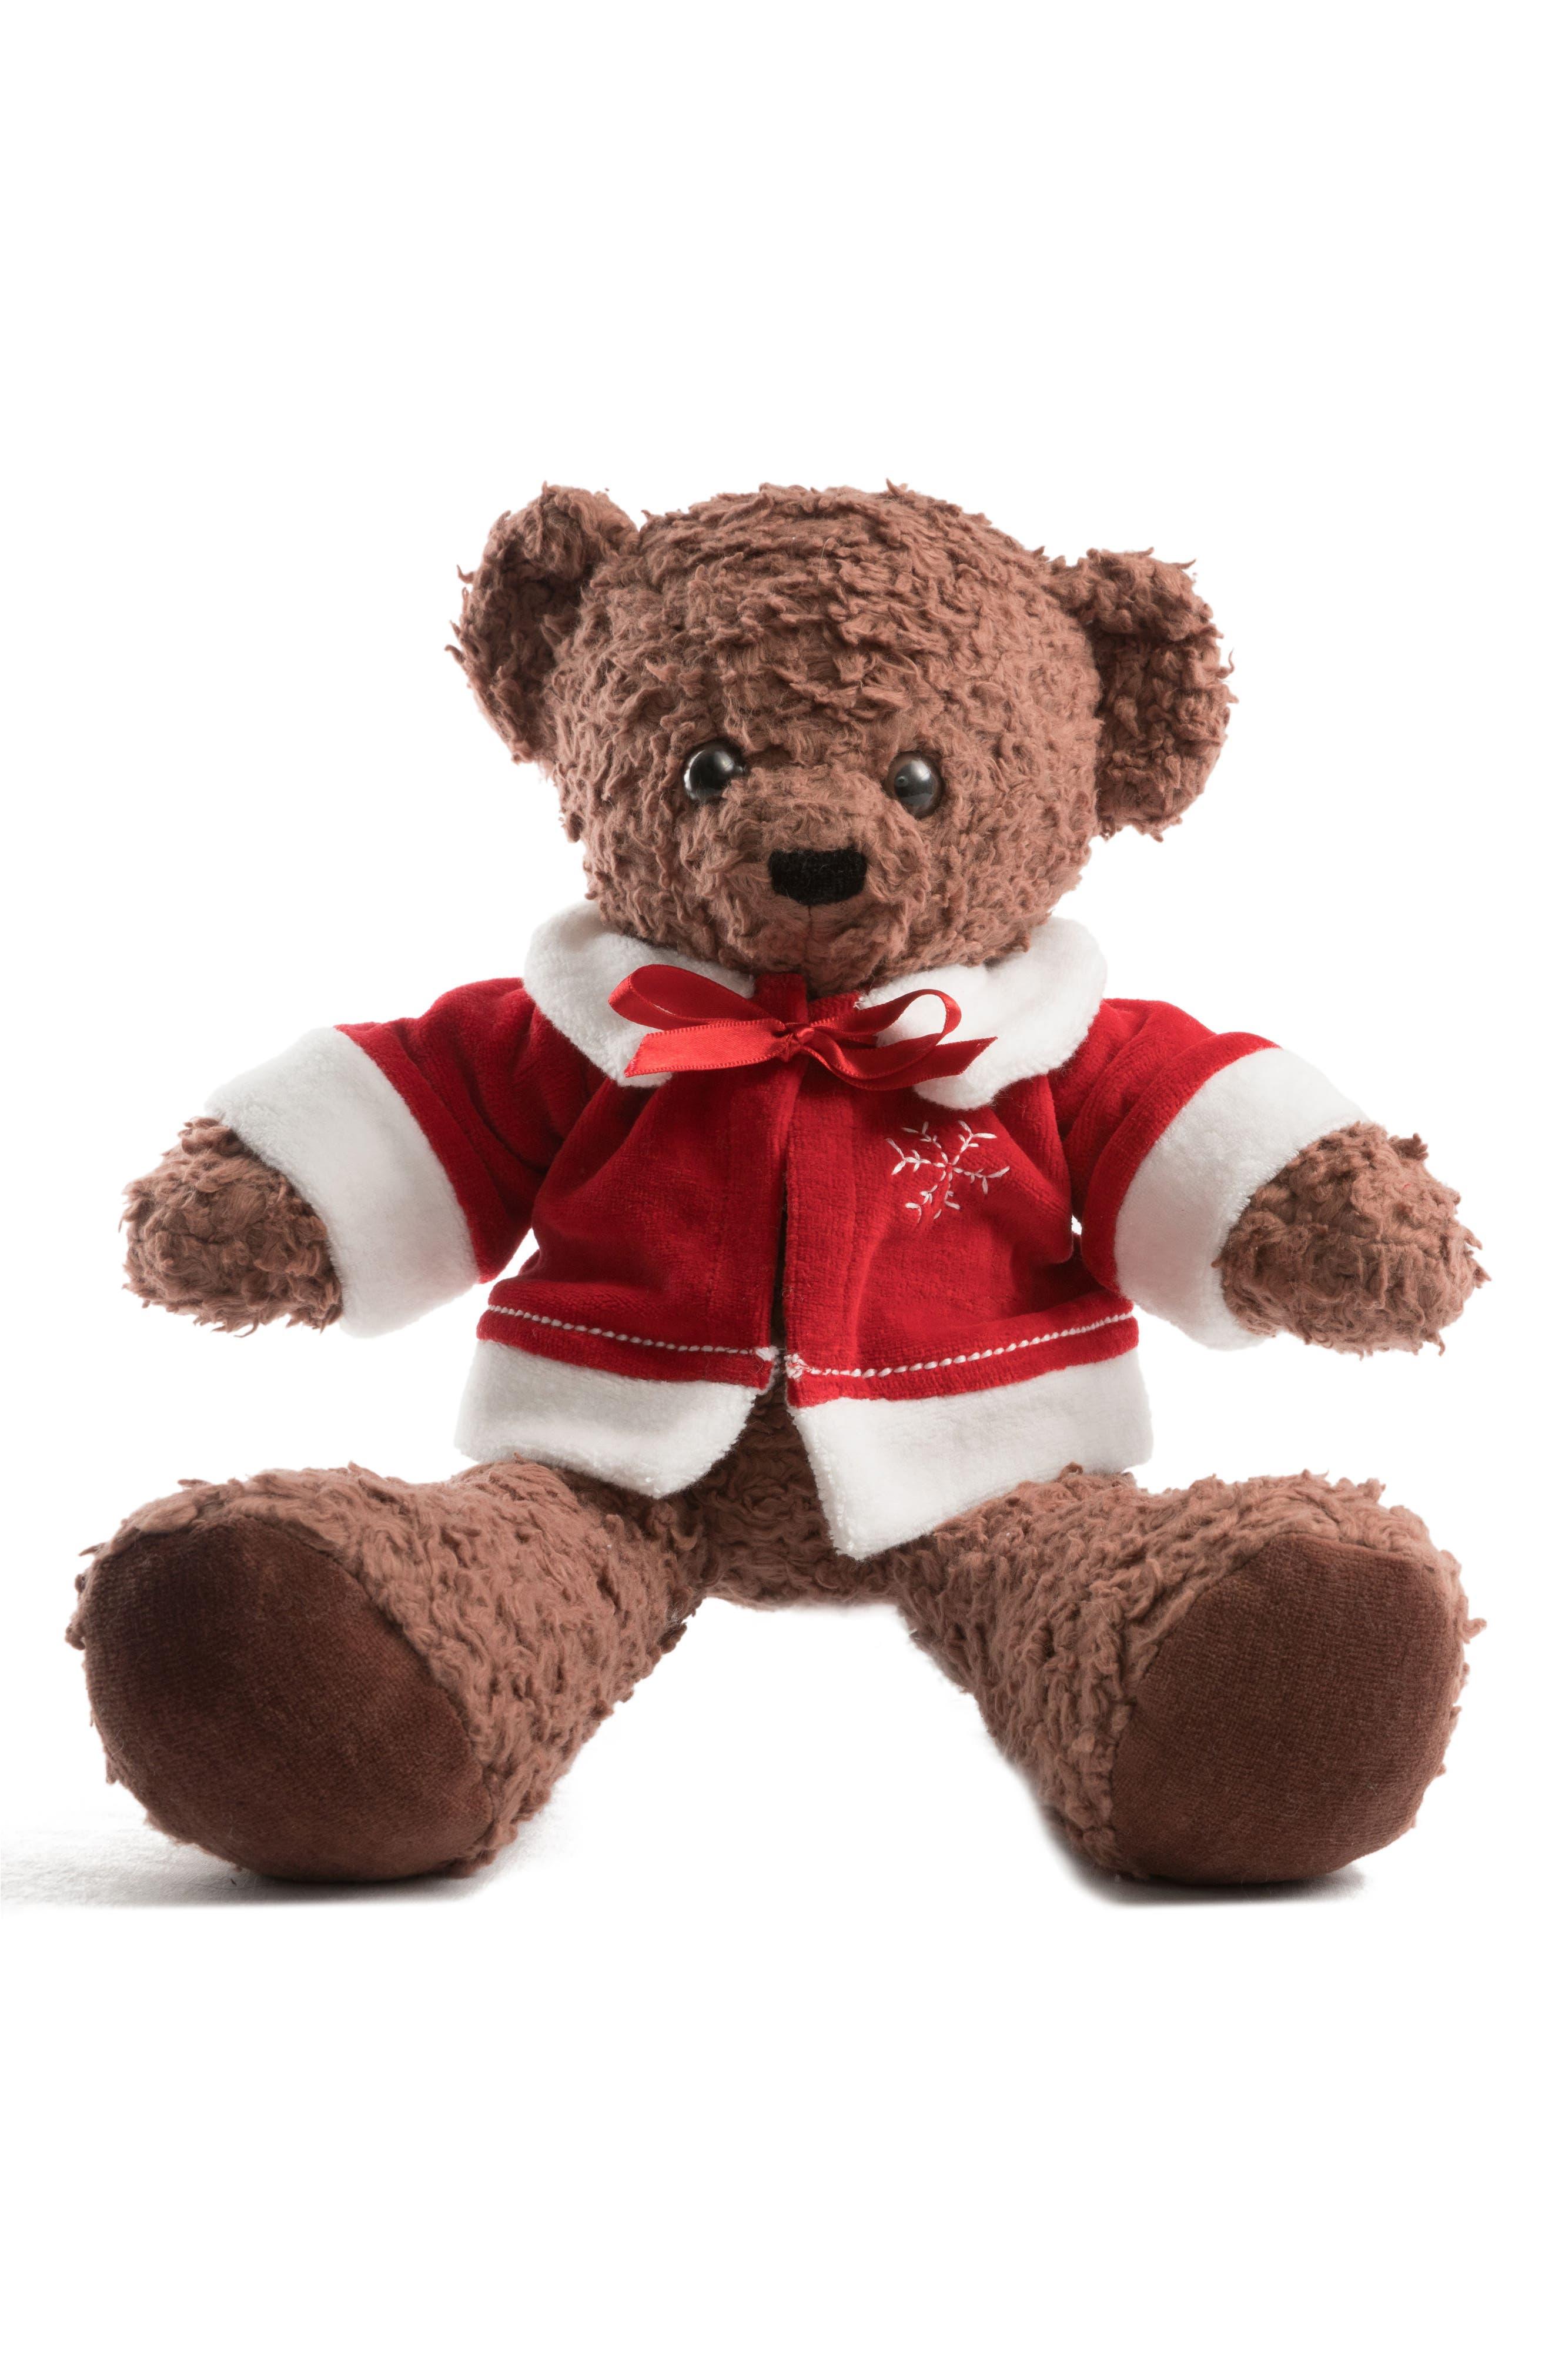 Medium Stuffed Bear with Holiday Jacket,                             Main thumbnail 2, color,